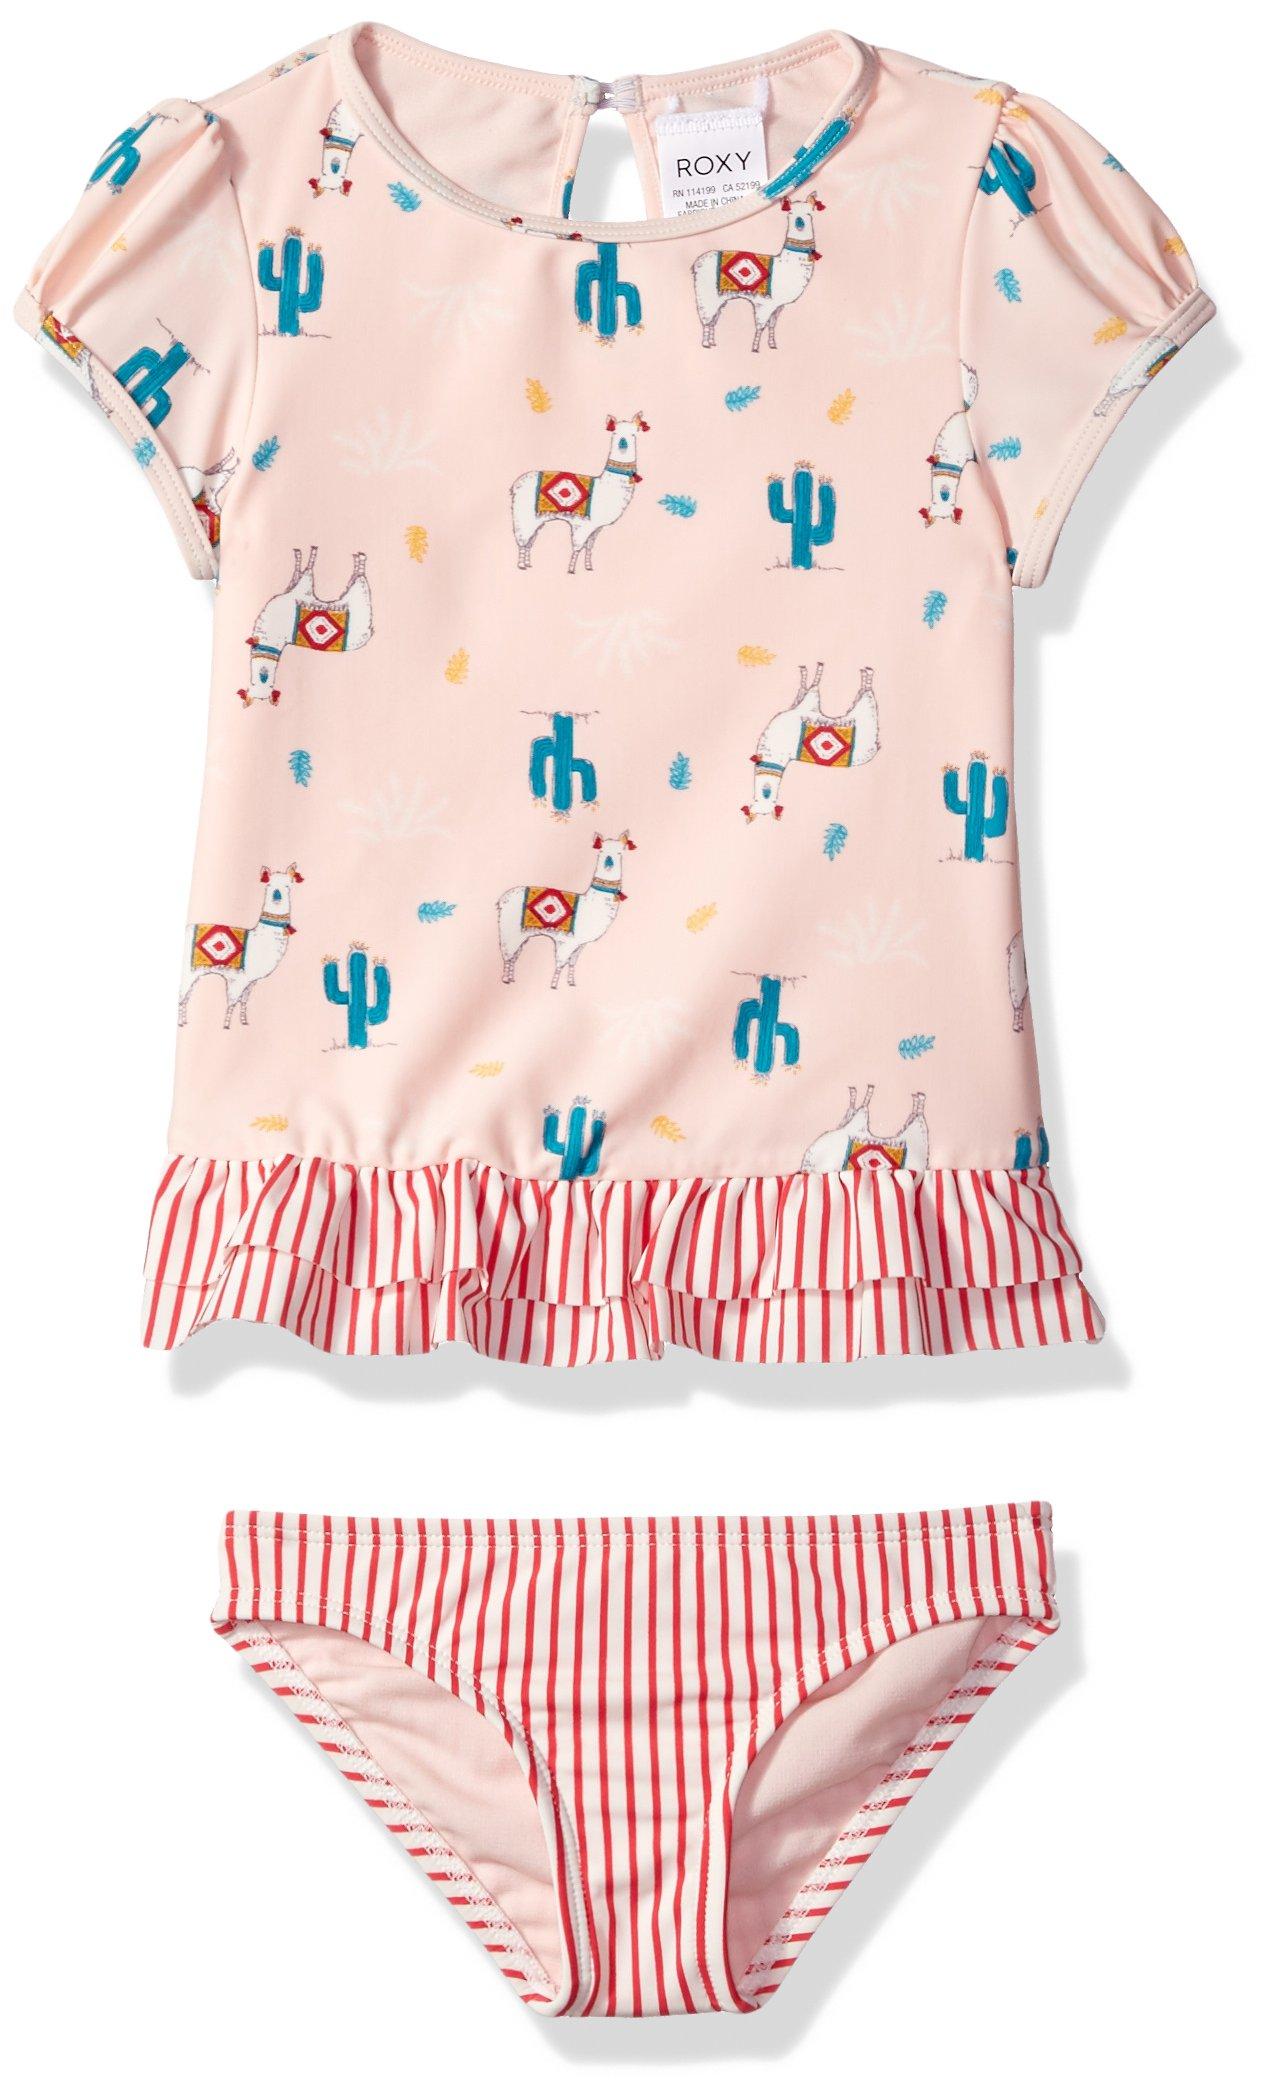 Roxy Little Girls' Cute Travel Fashion Short Sleeve Rashguard Set, Rose Quartz Swim Peru Travel, 5 by Roxy